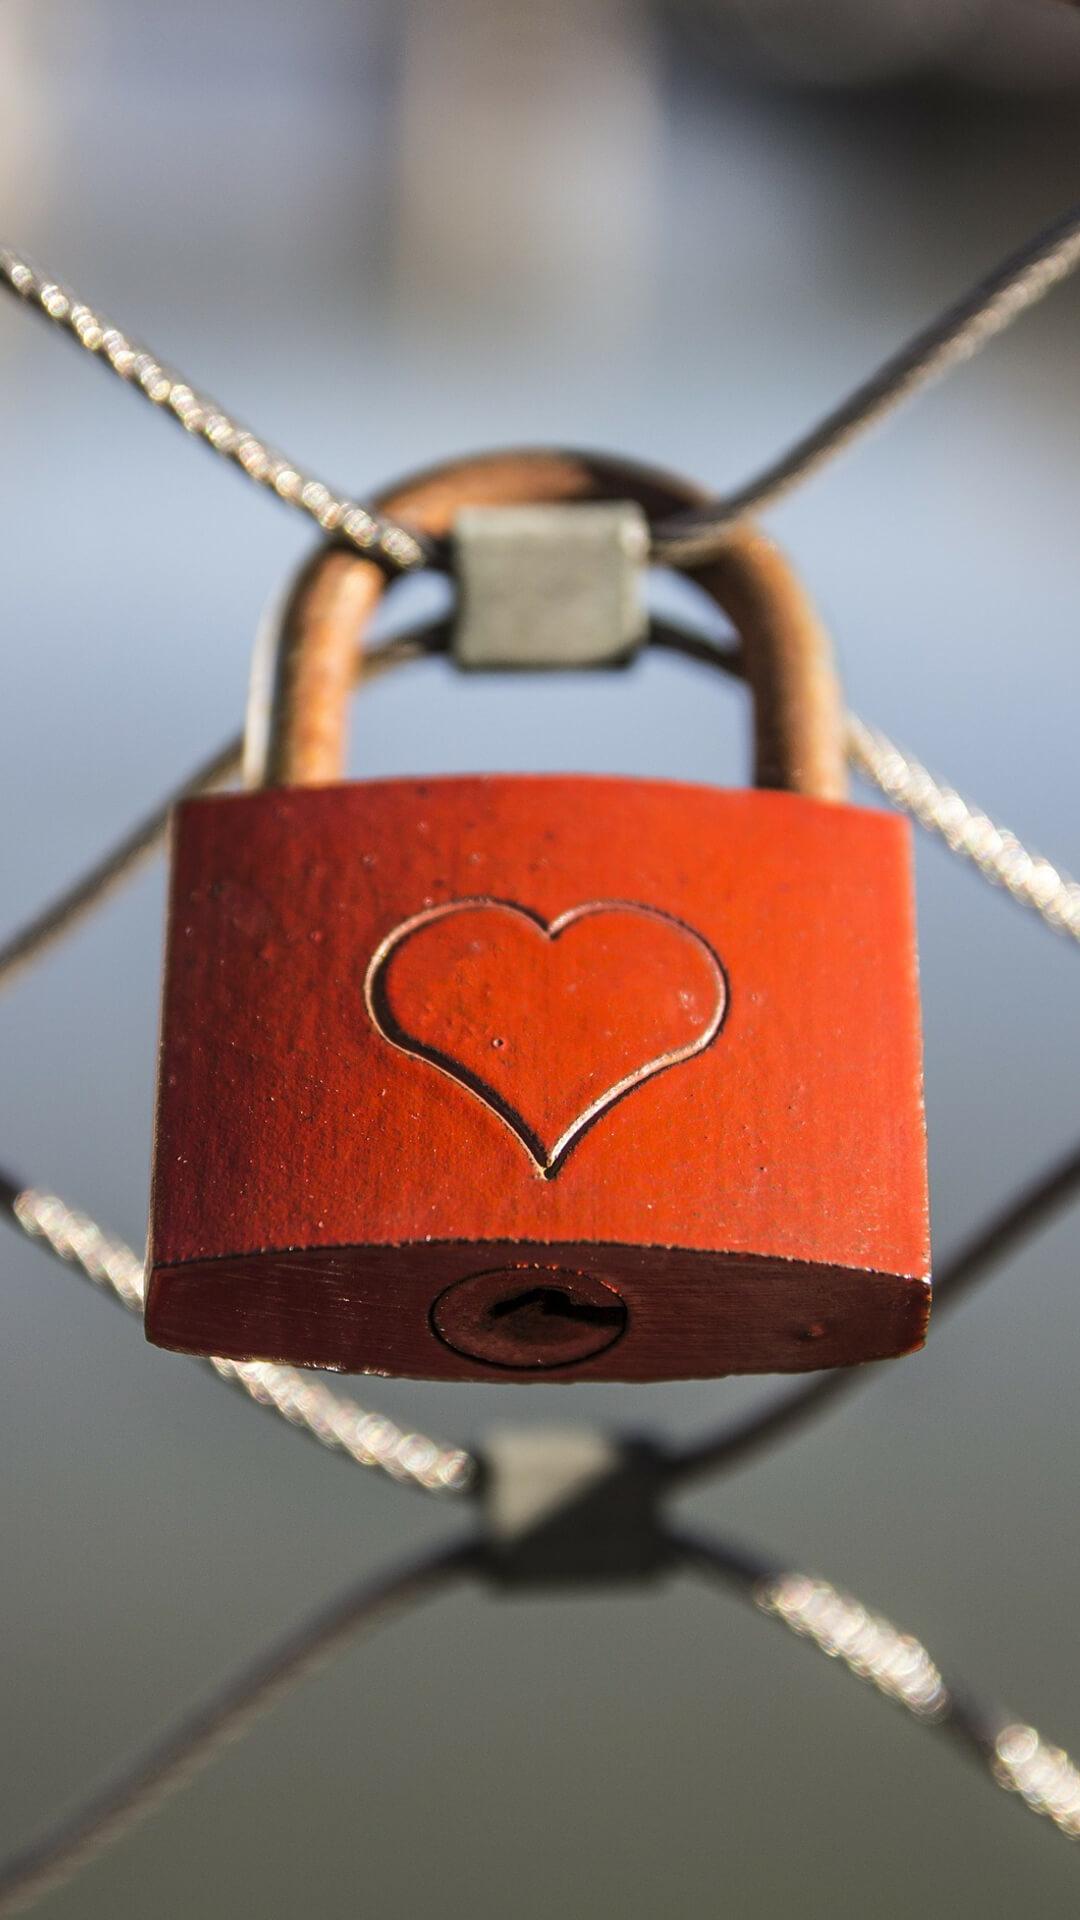 Lock Screen Wallpaper Hd Love 2276201 Hd Wallpaper